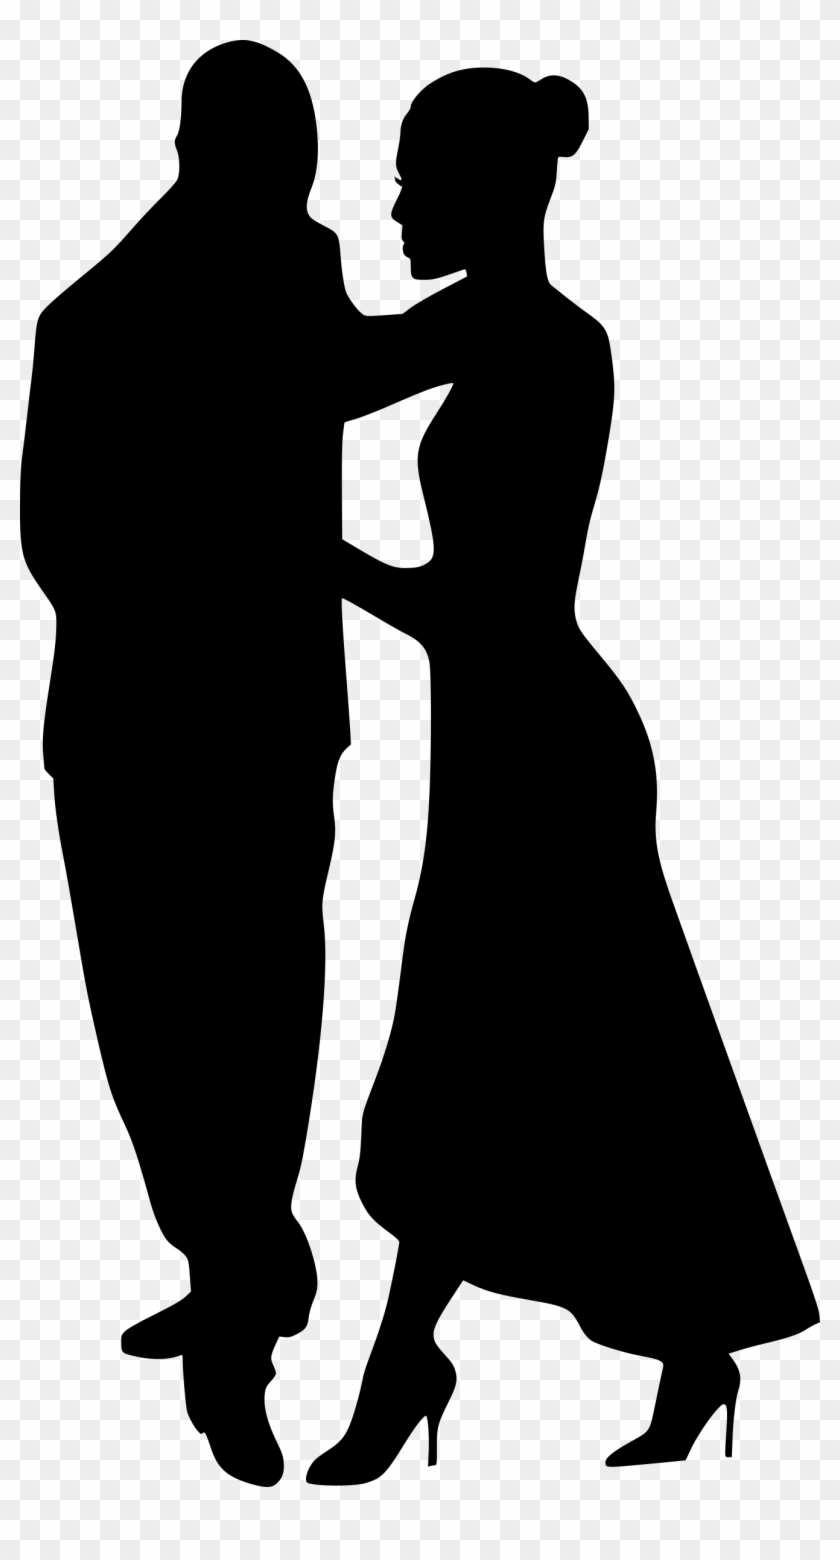 Cartoon Couple Holding Hands Cartoon Vector Clipart - FriendlyStock